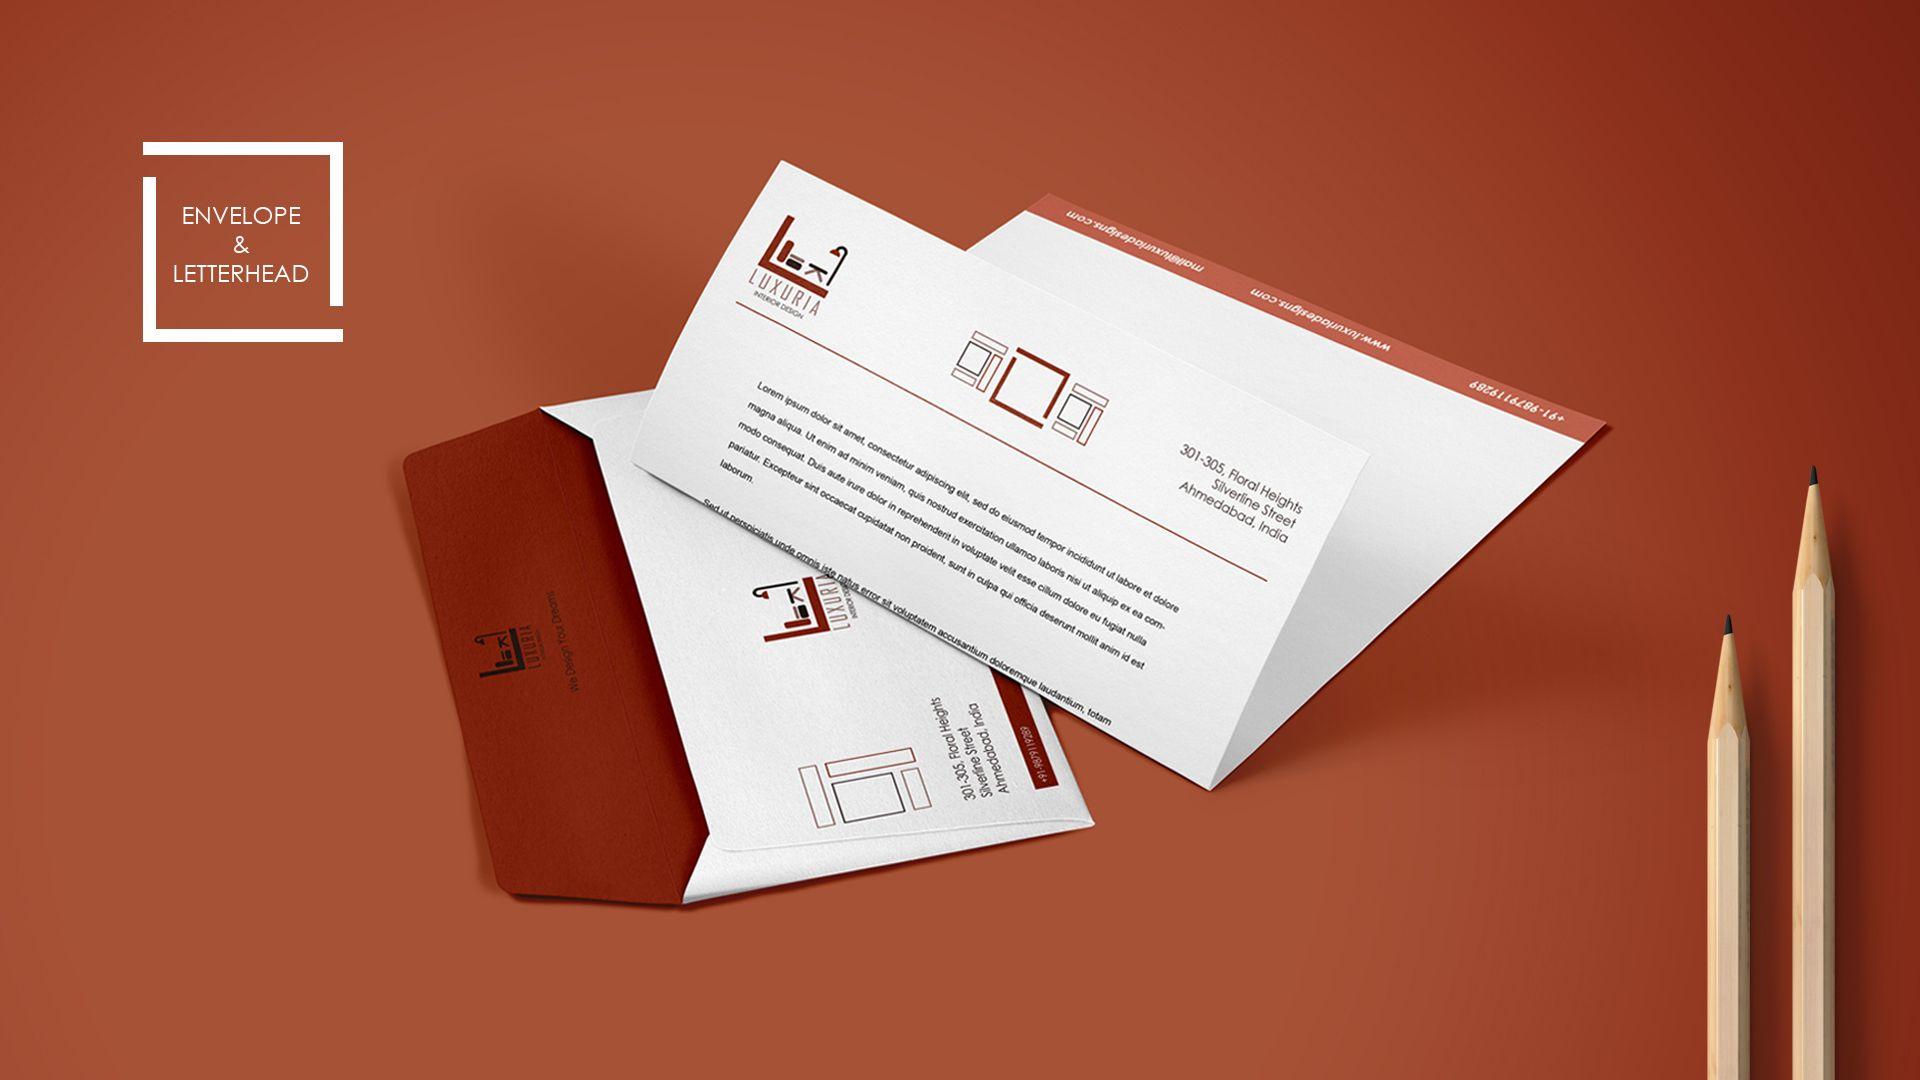 Luxuria Interior Design Branding Envelope Letterhead Turtlepalette Graphicsdesign Corporate Branding Pa Letterhead Template Letterhead Branding Design